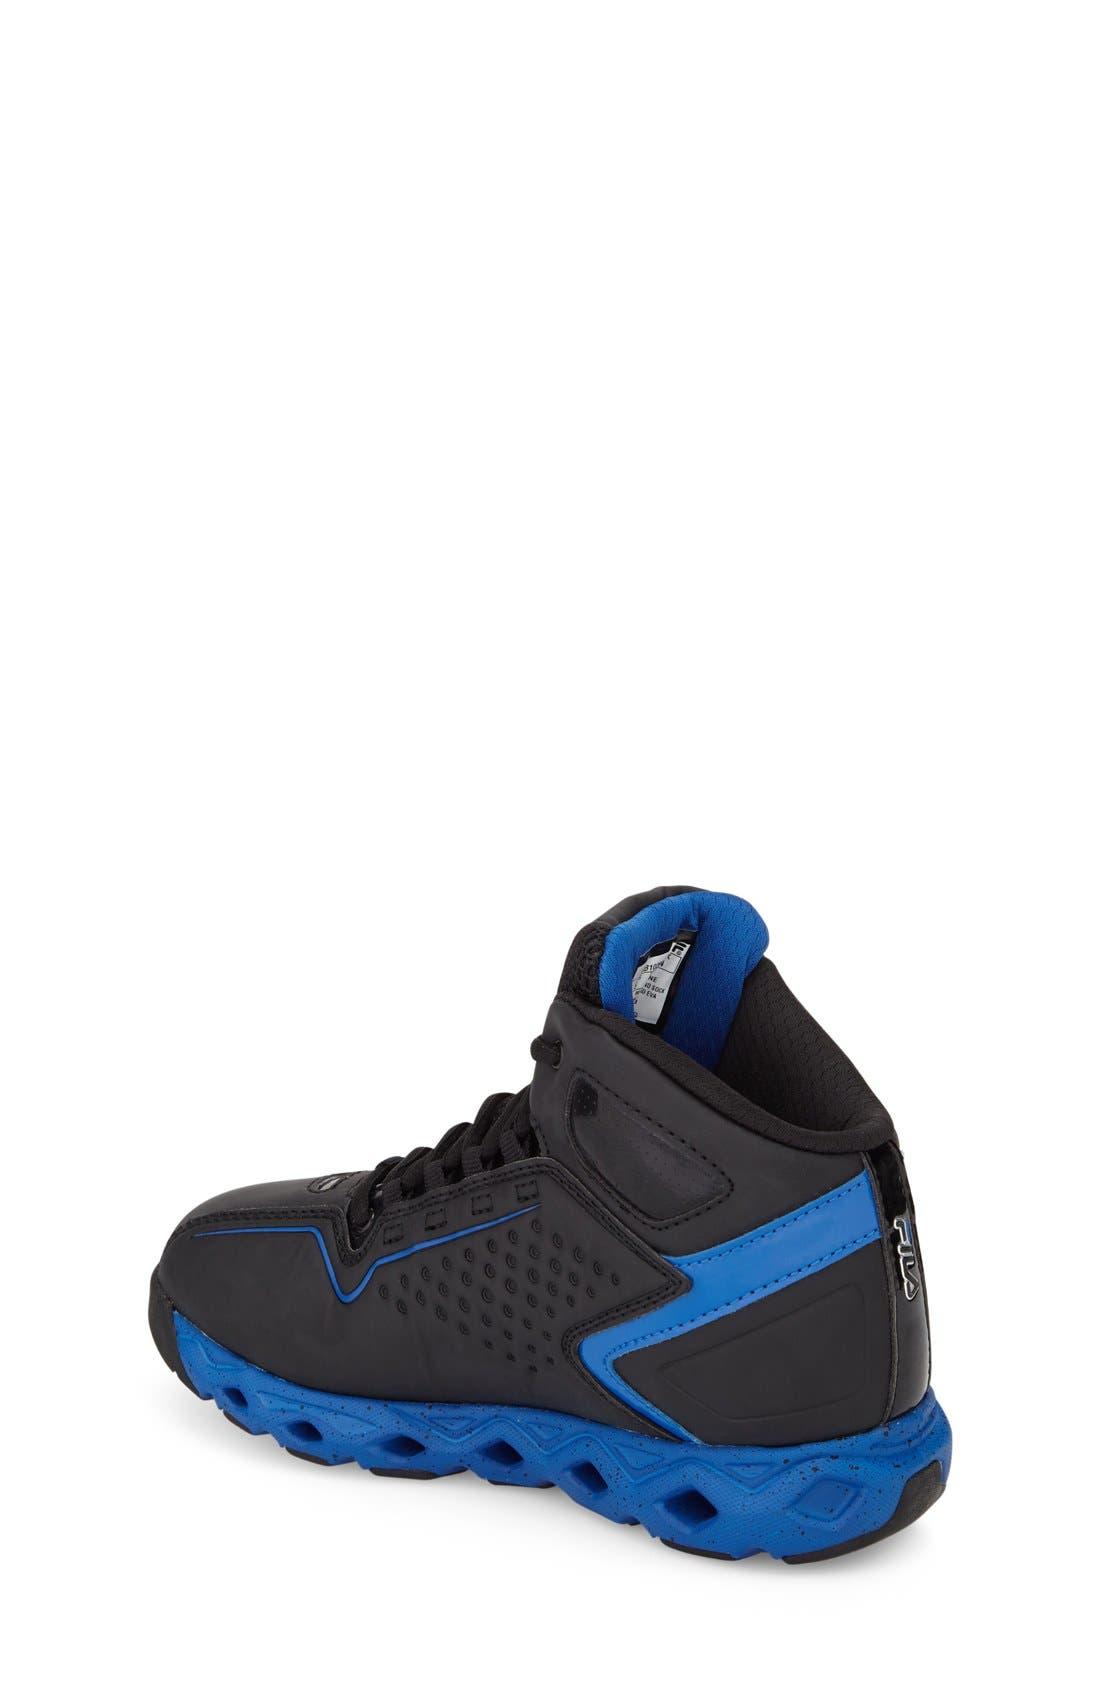 FILA,                             Big Bang High Top Sneaker,                             Alternate thumbnail 2, color,                             001